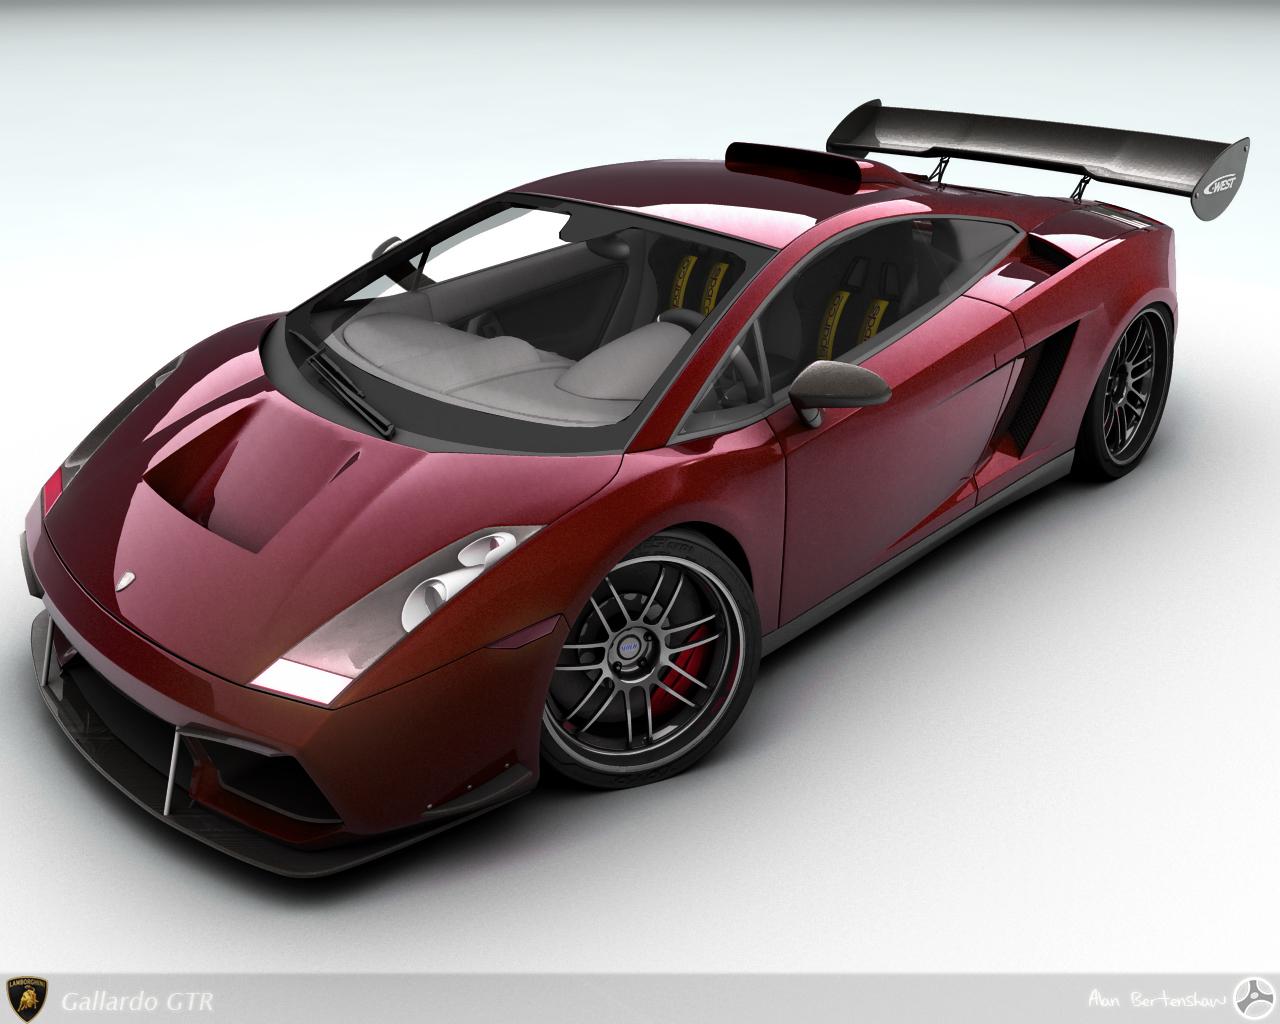 Lamborghini Gallardo Gtr By Afroafroguy On Deviantart